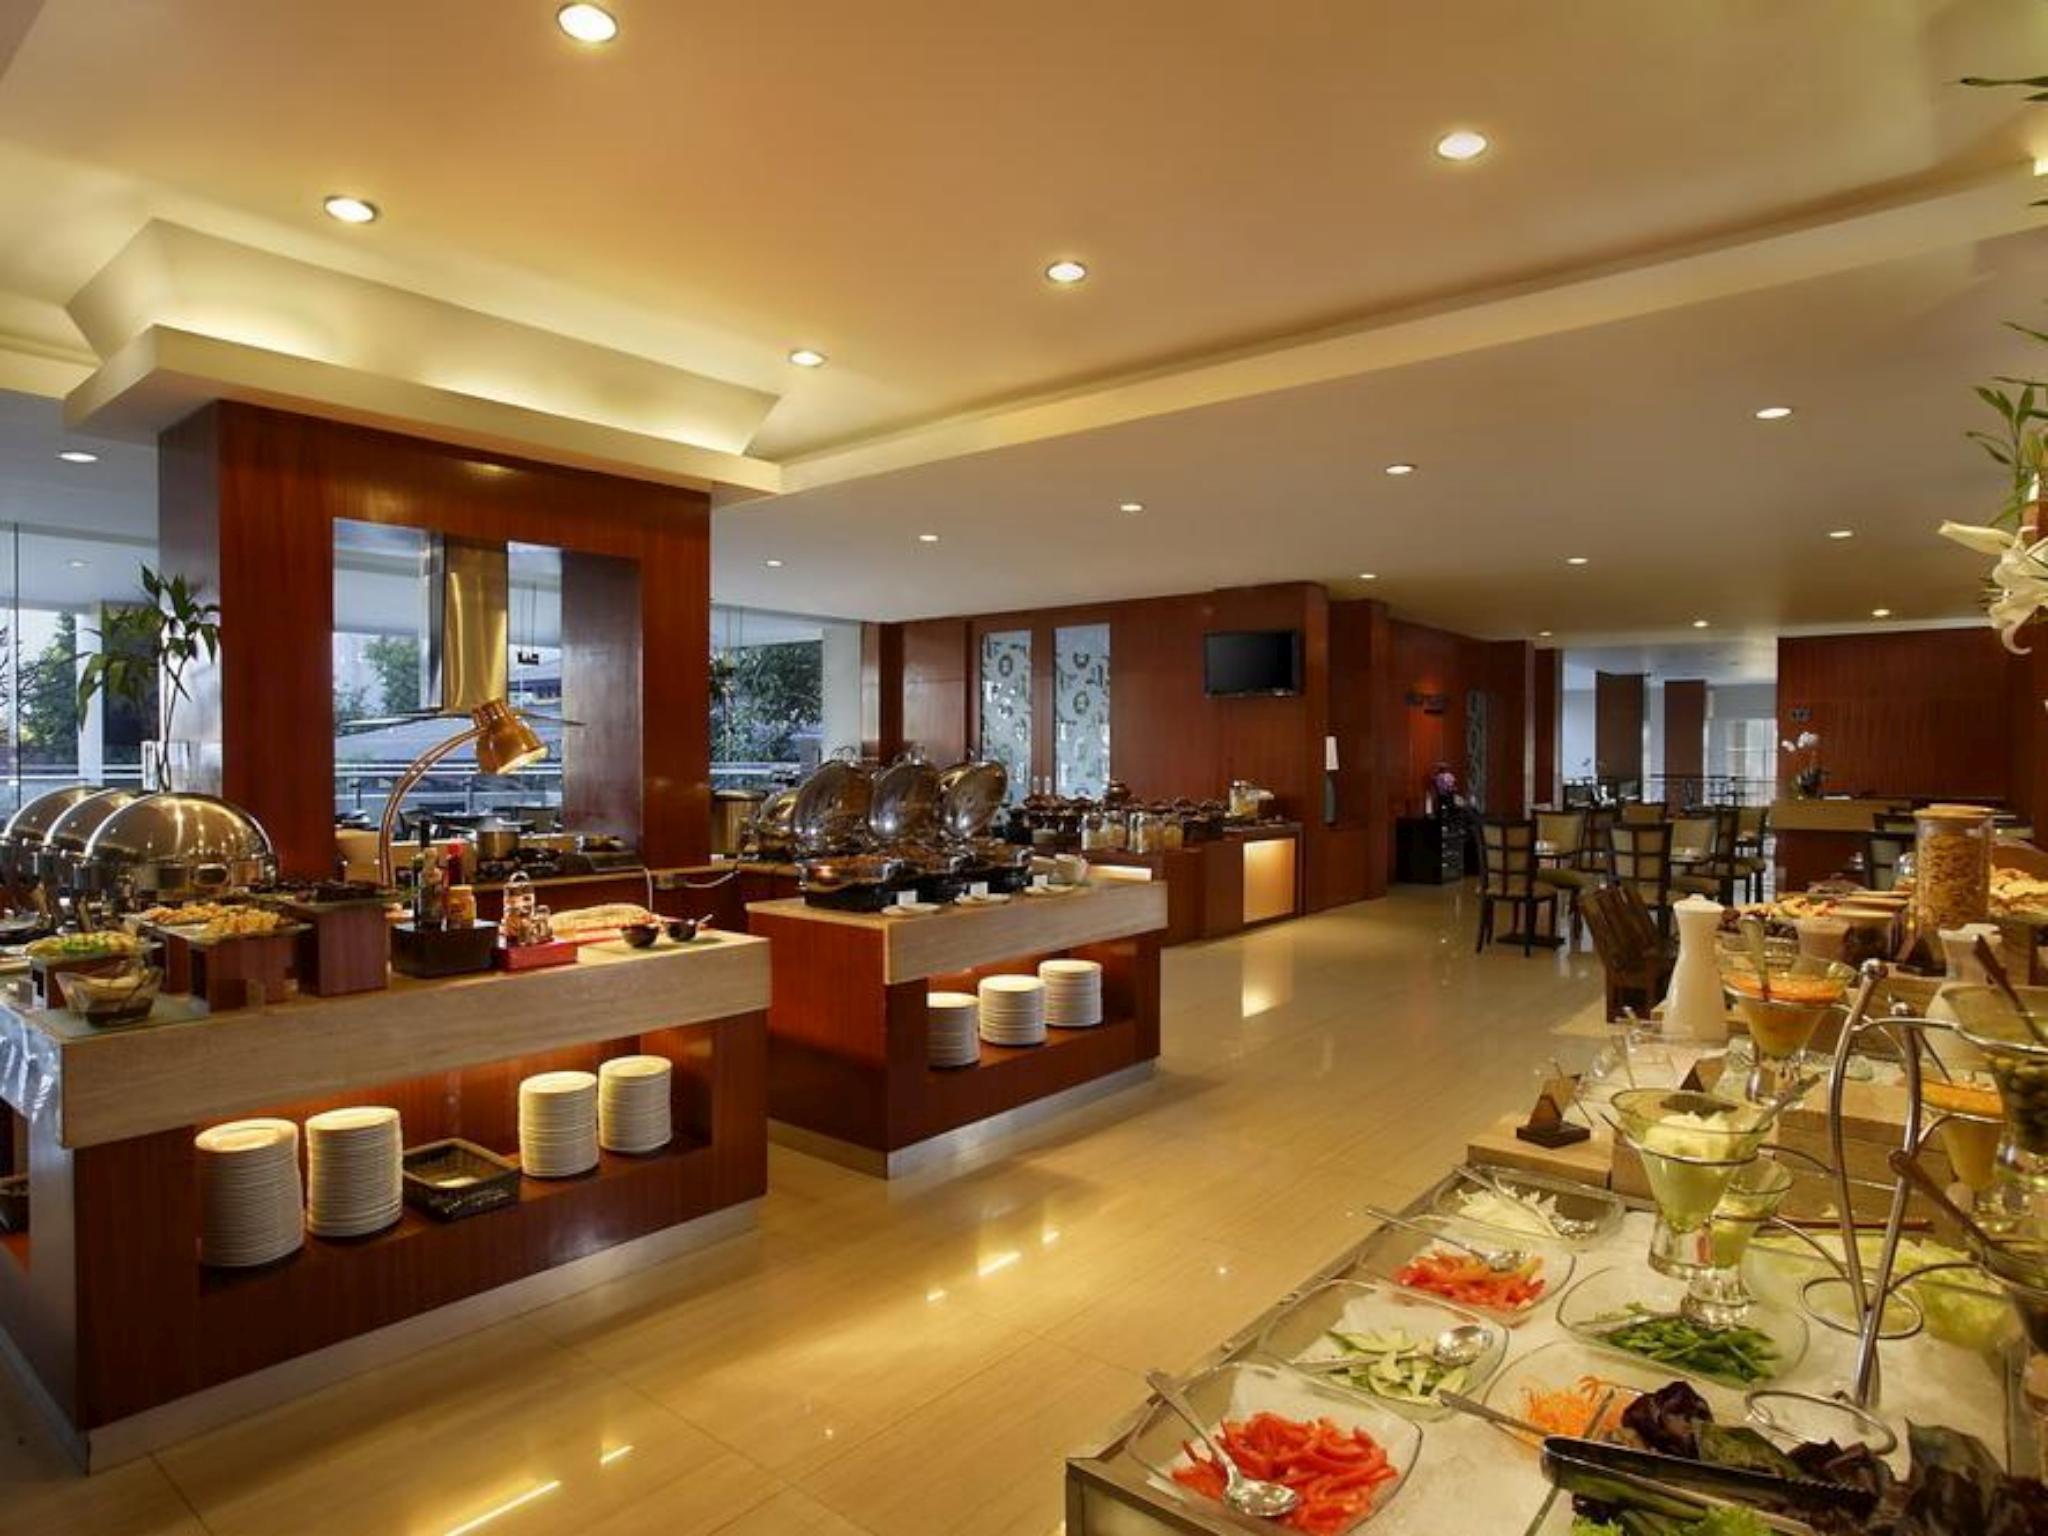 Lokasi Hotel Santika Jemursari Jl. Raya Jemursari No. 258